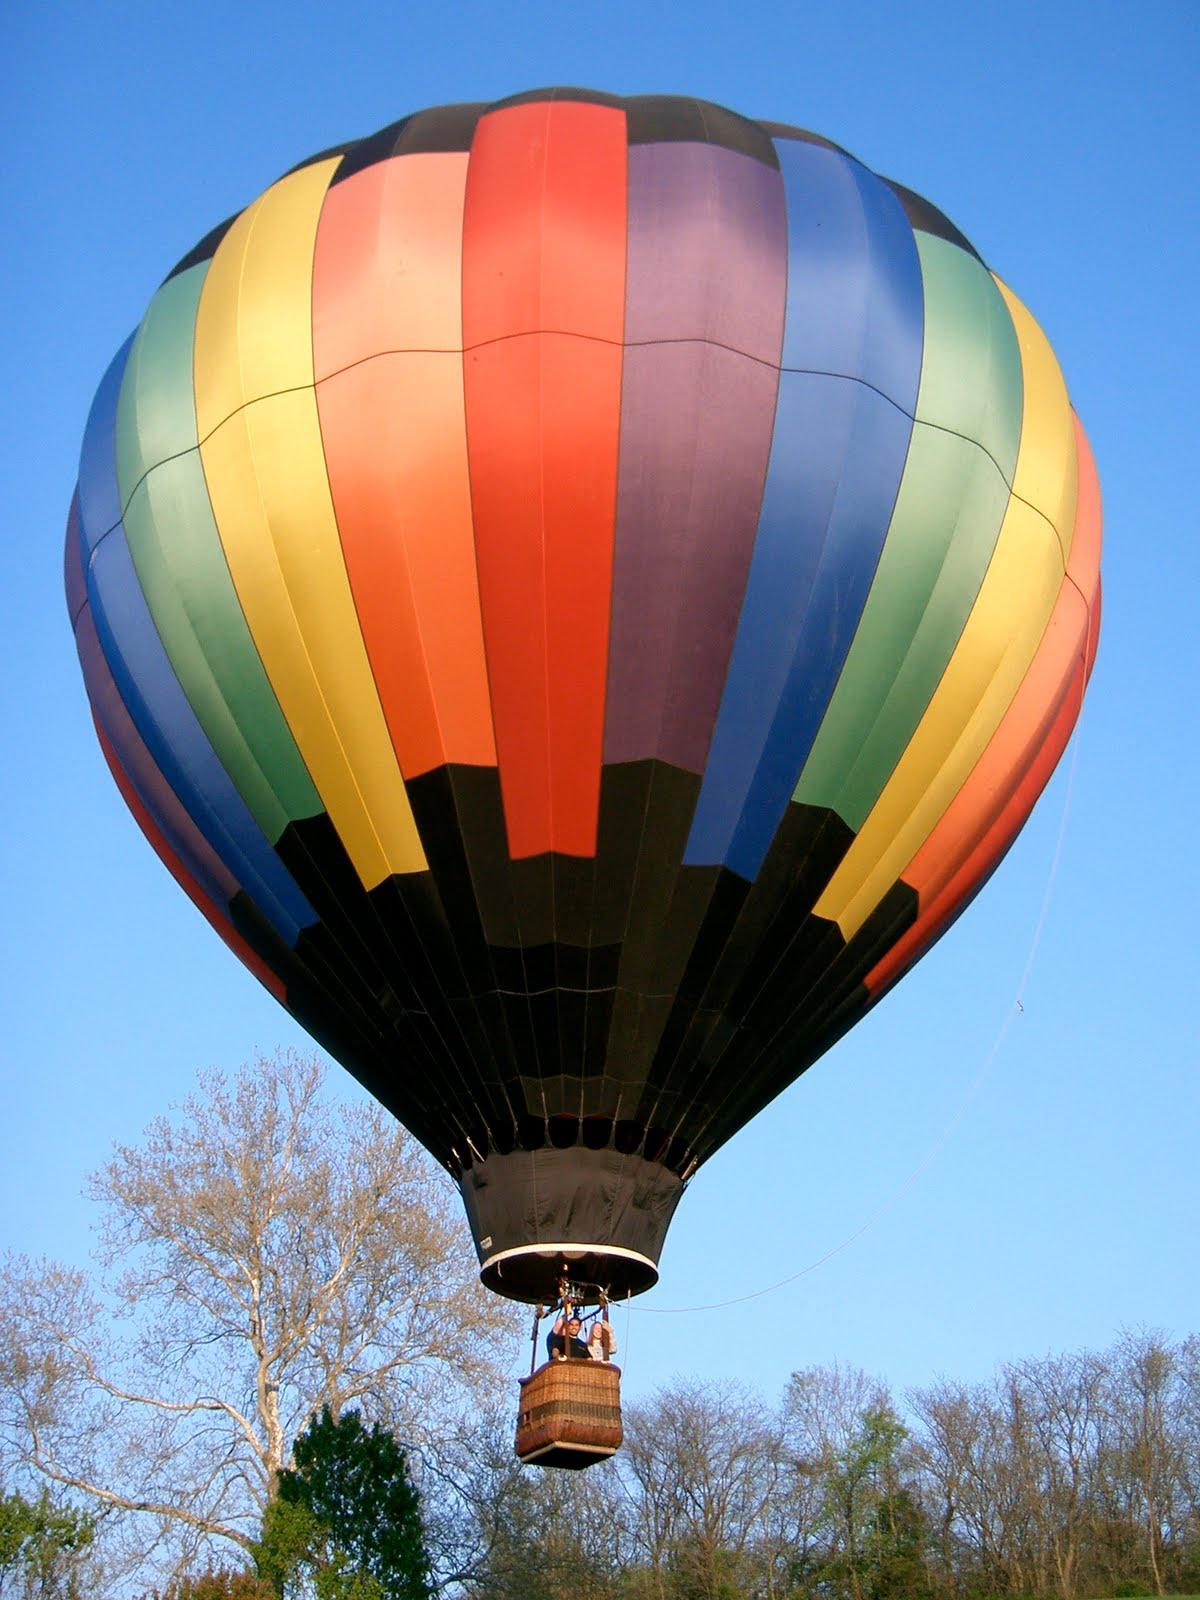 unique wedding in ann arbor michigan with hot air balloon rides